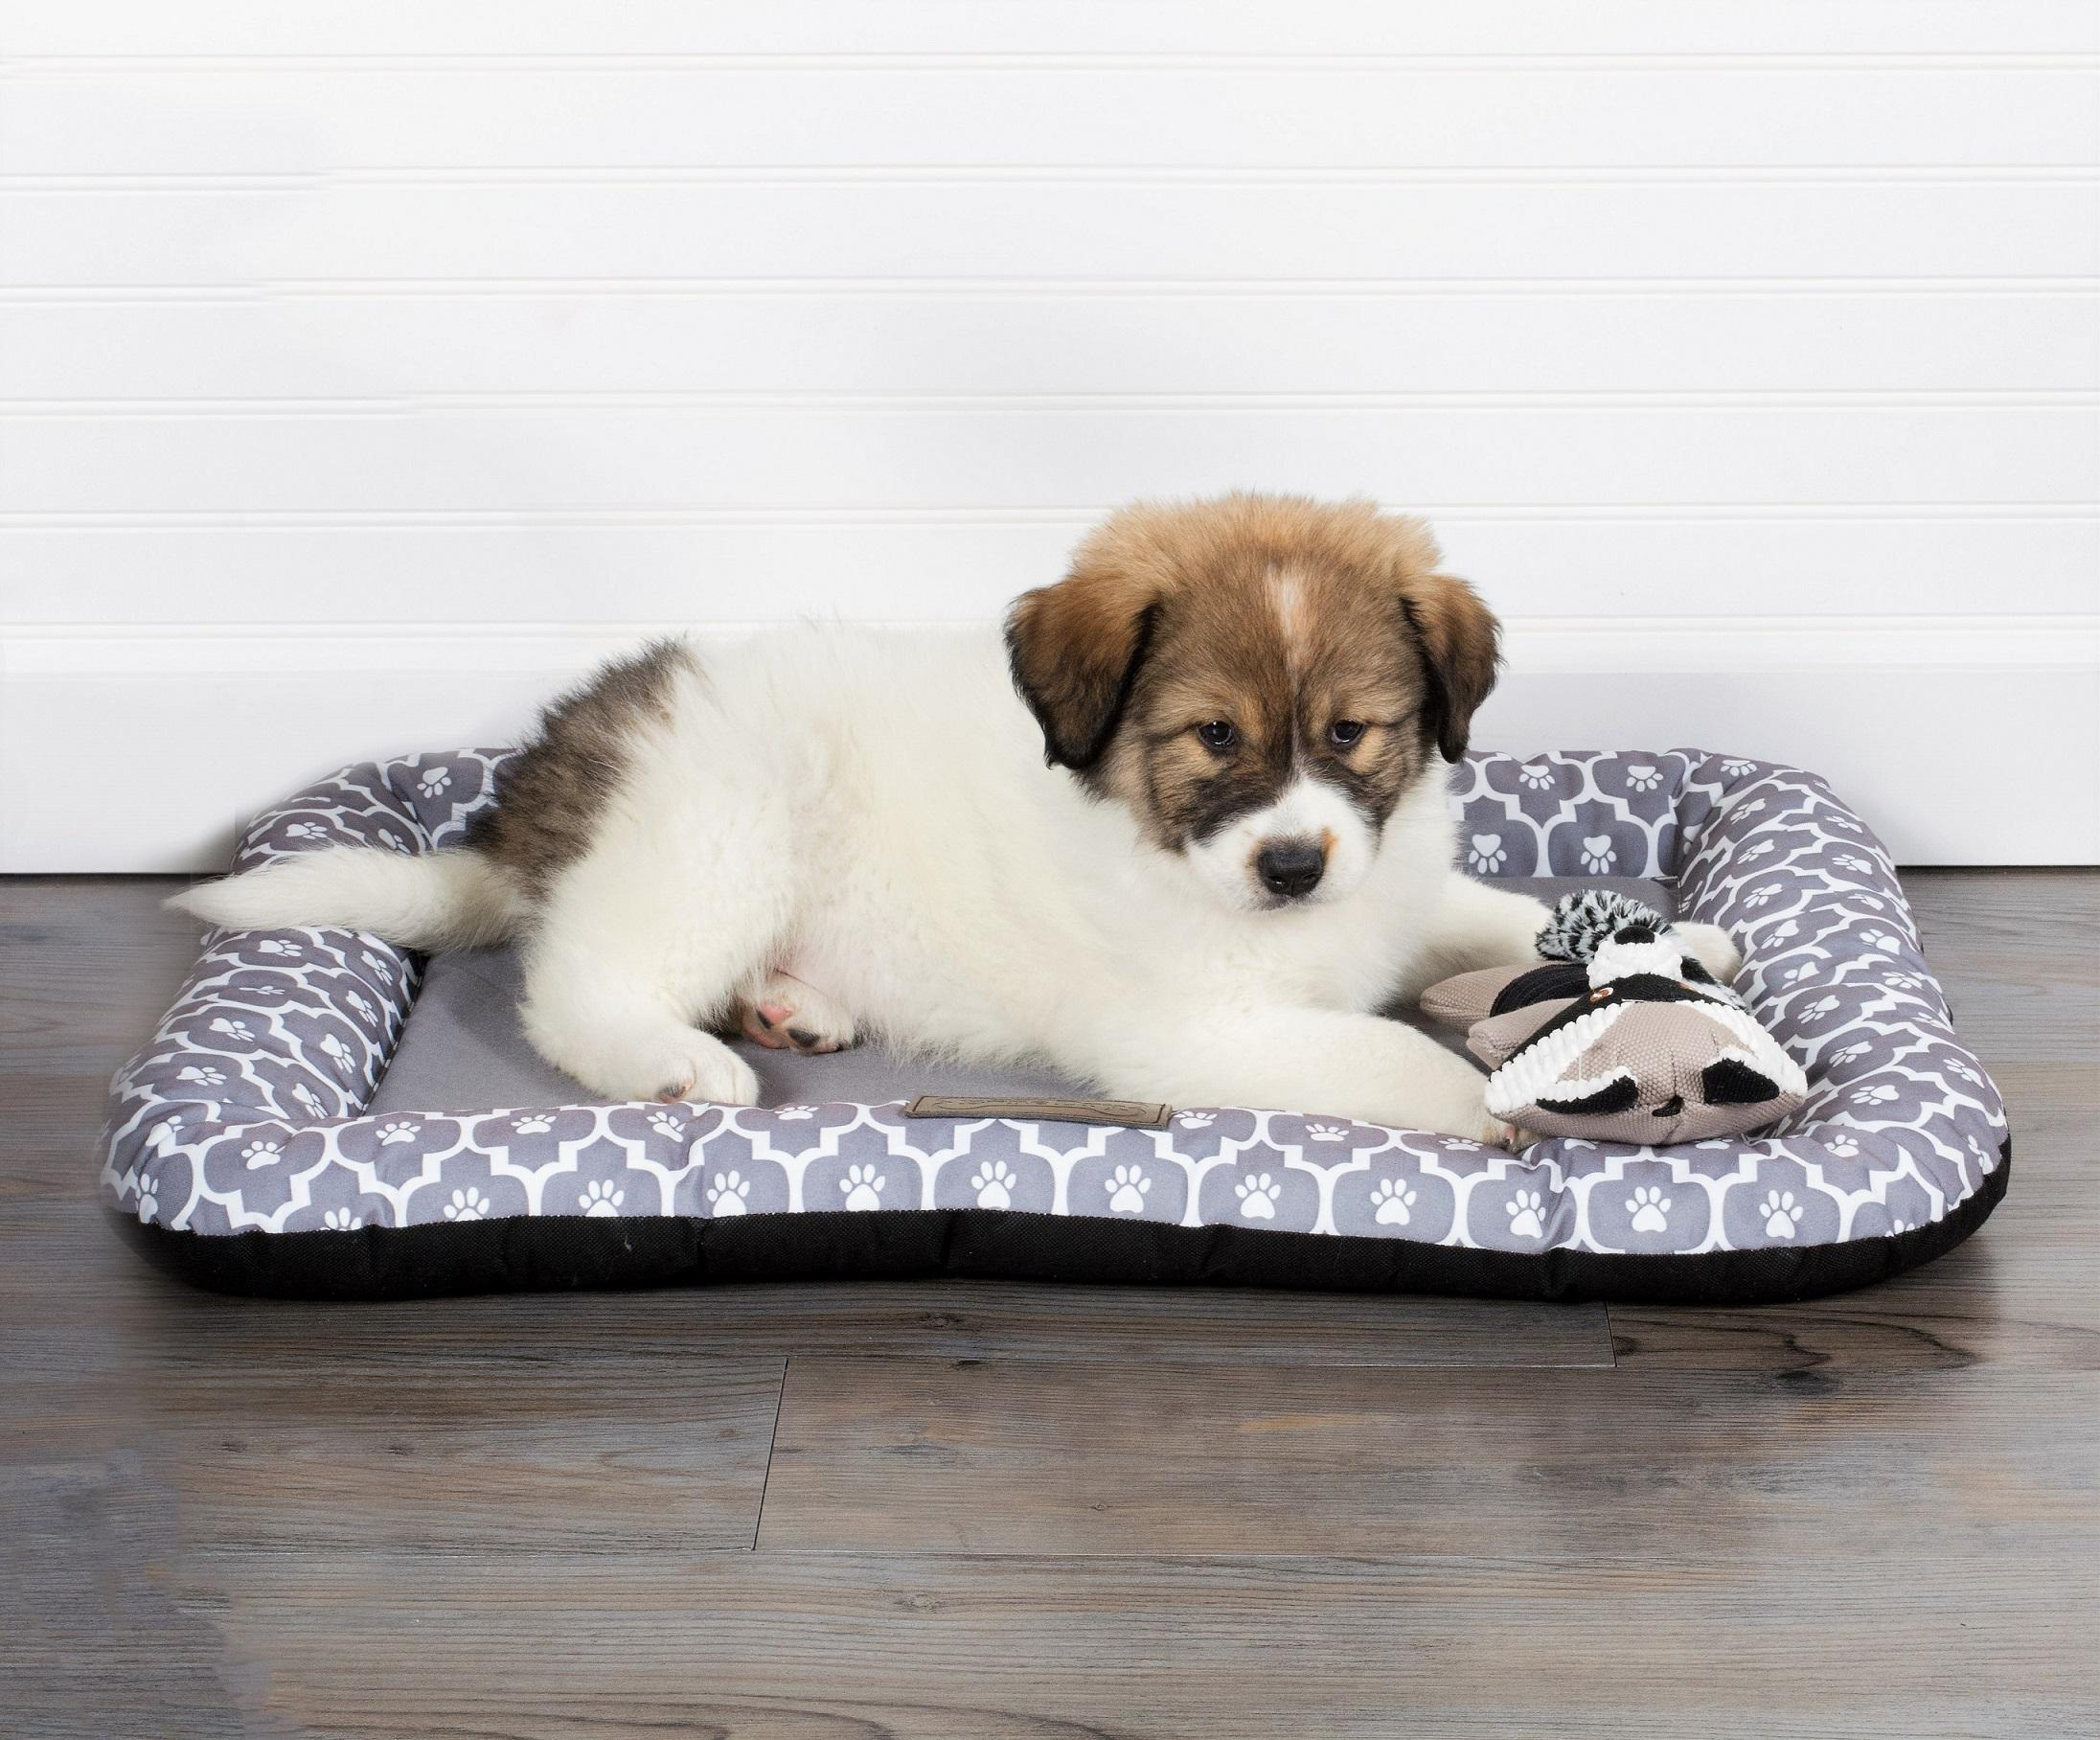 Amazon.com : Bone Dry DII Stripe Embroidered Paw Print Pet